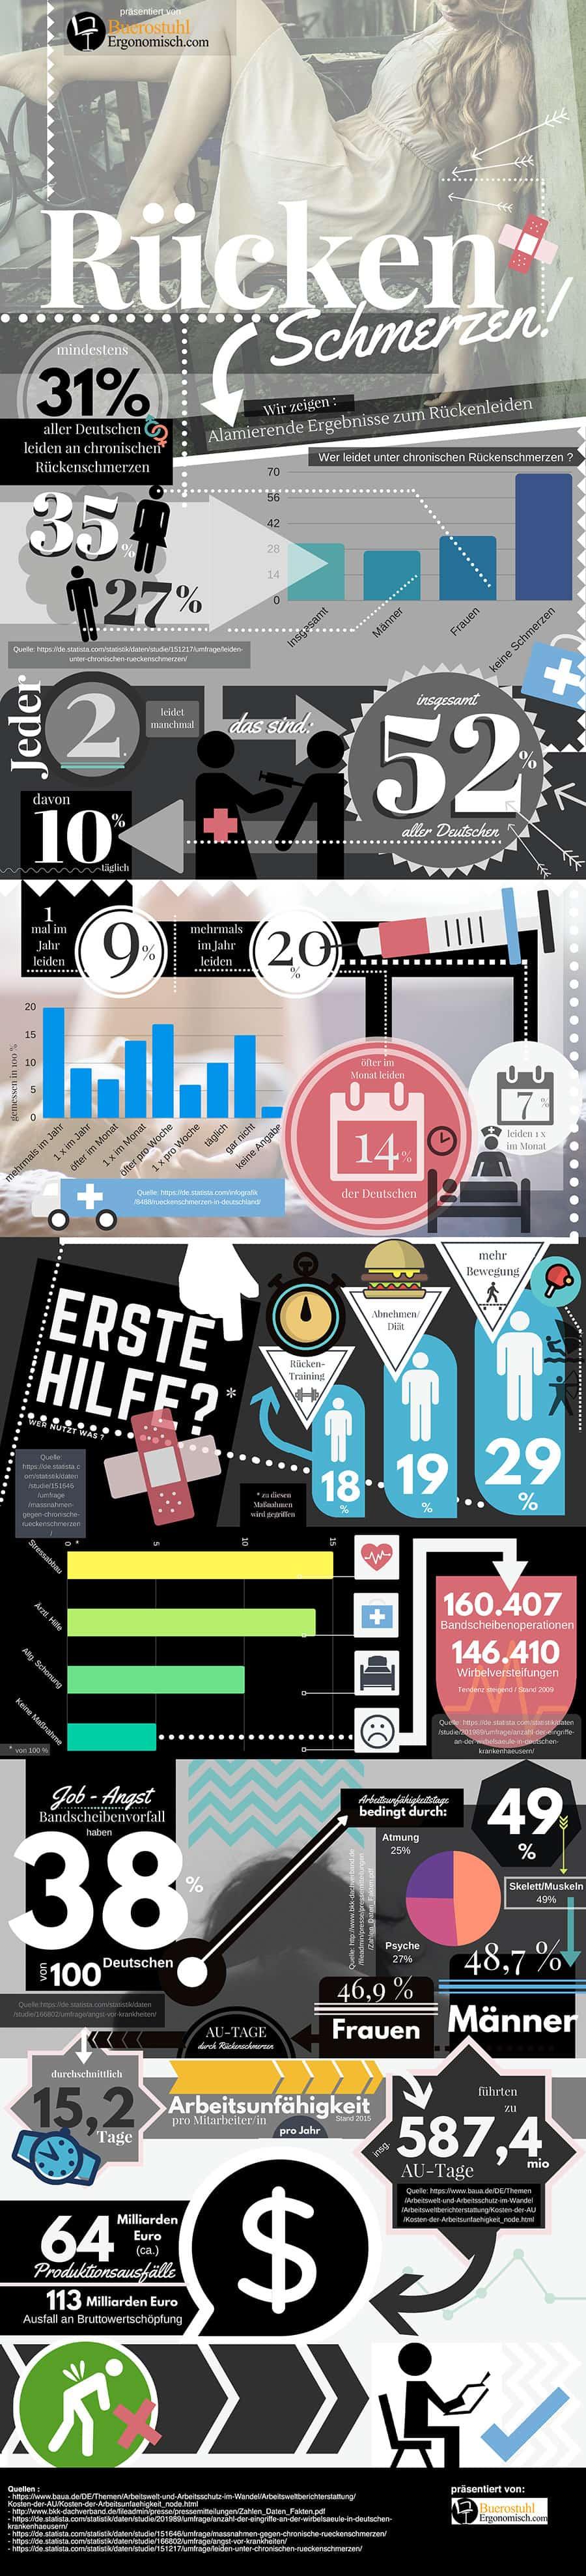 buerostuhl-ergonomisch-com-infografik